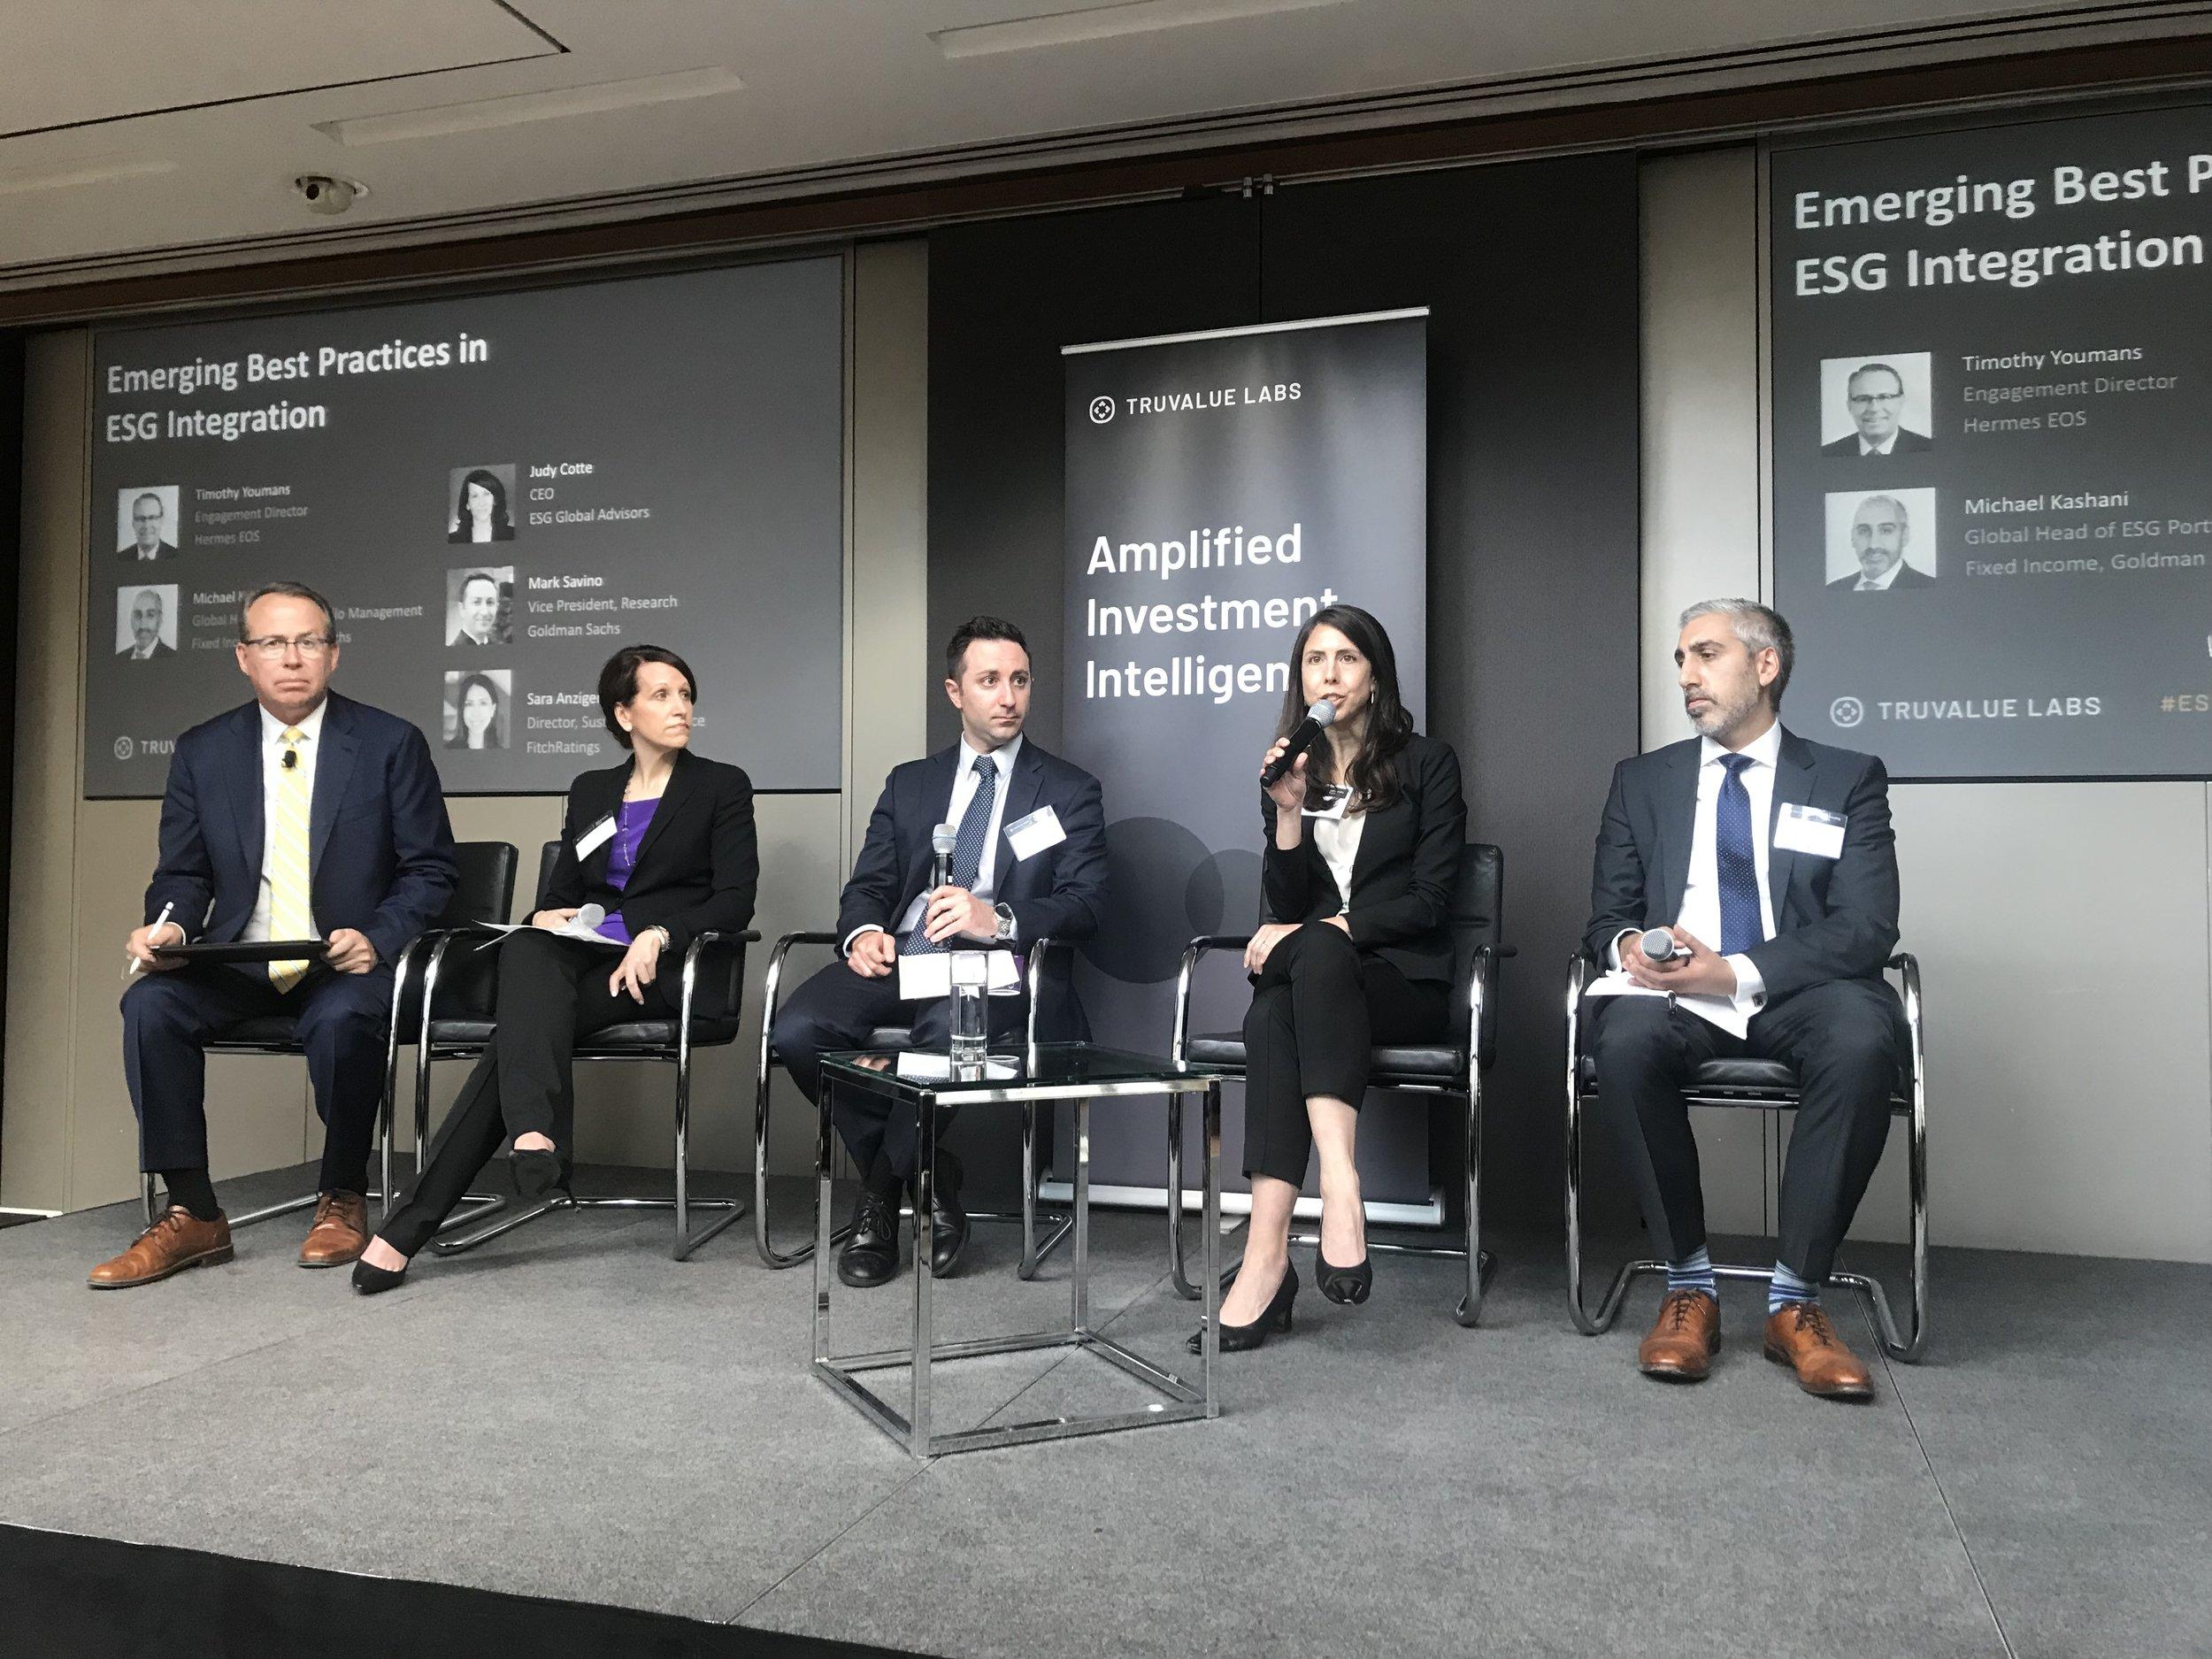 Tim Youmans, Hermes EOS Judy Cotte, ESG Global Advisors Sachs Asset Management Mark Savino, Morgan Stanley Sara Anzinger, Fitch Ratings Michael S. Kashani, Goldman